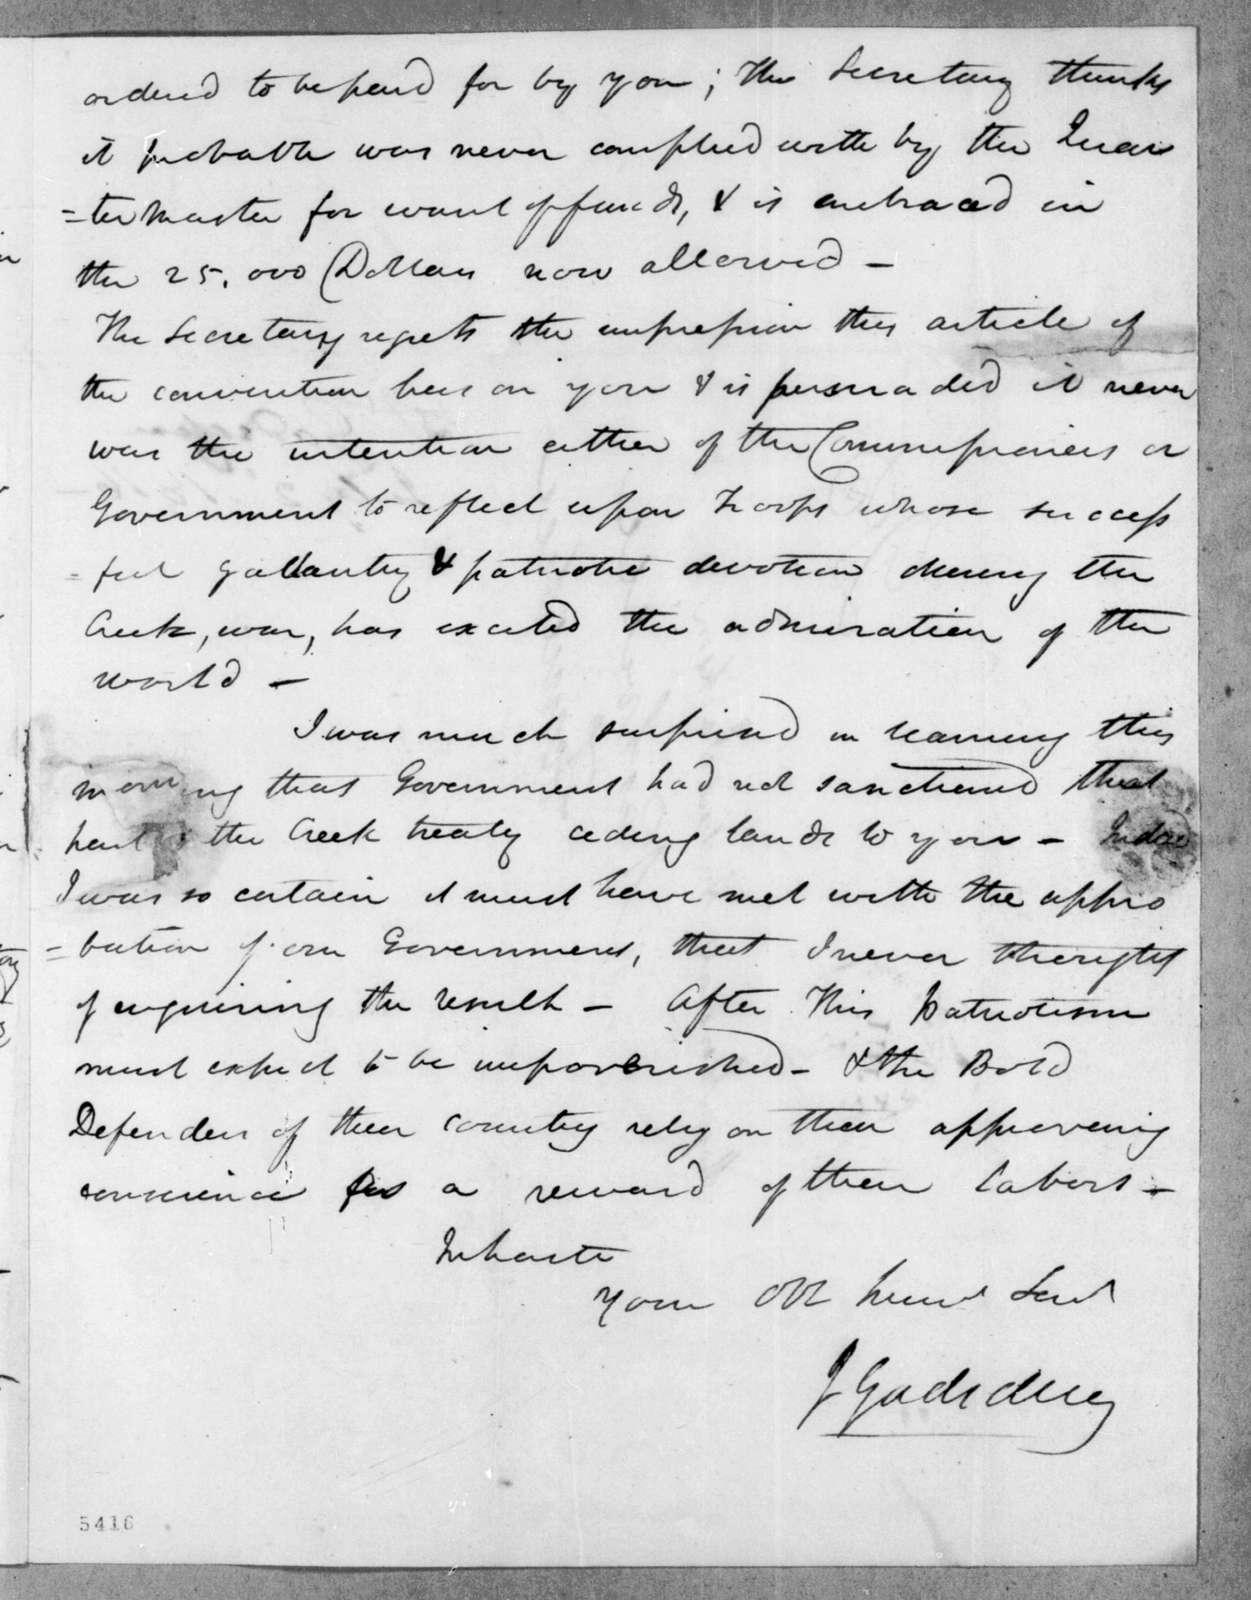 James Gadsden to Andrew Jackson, July 2, 1816